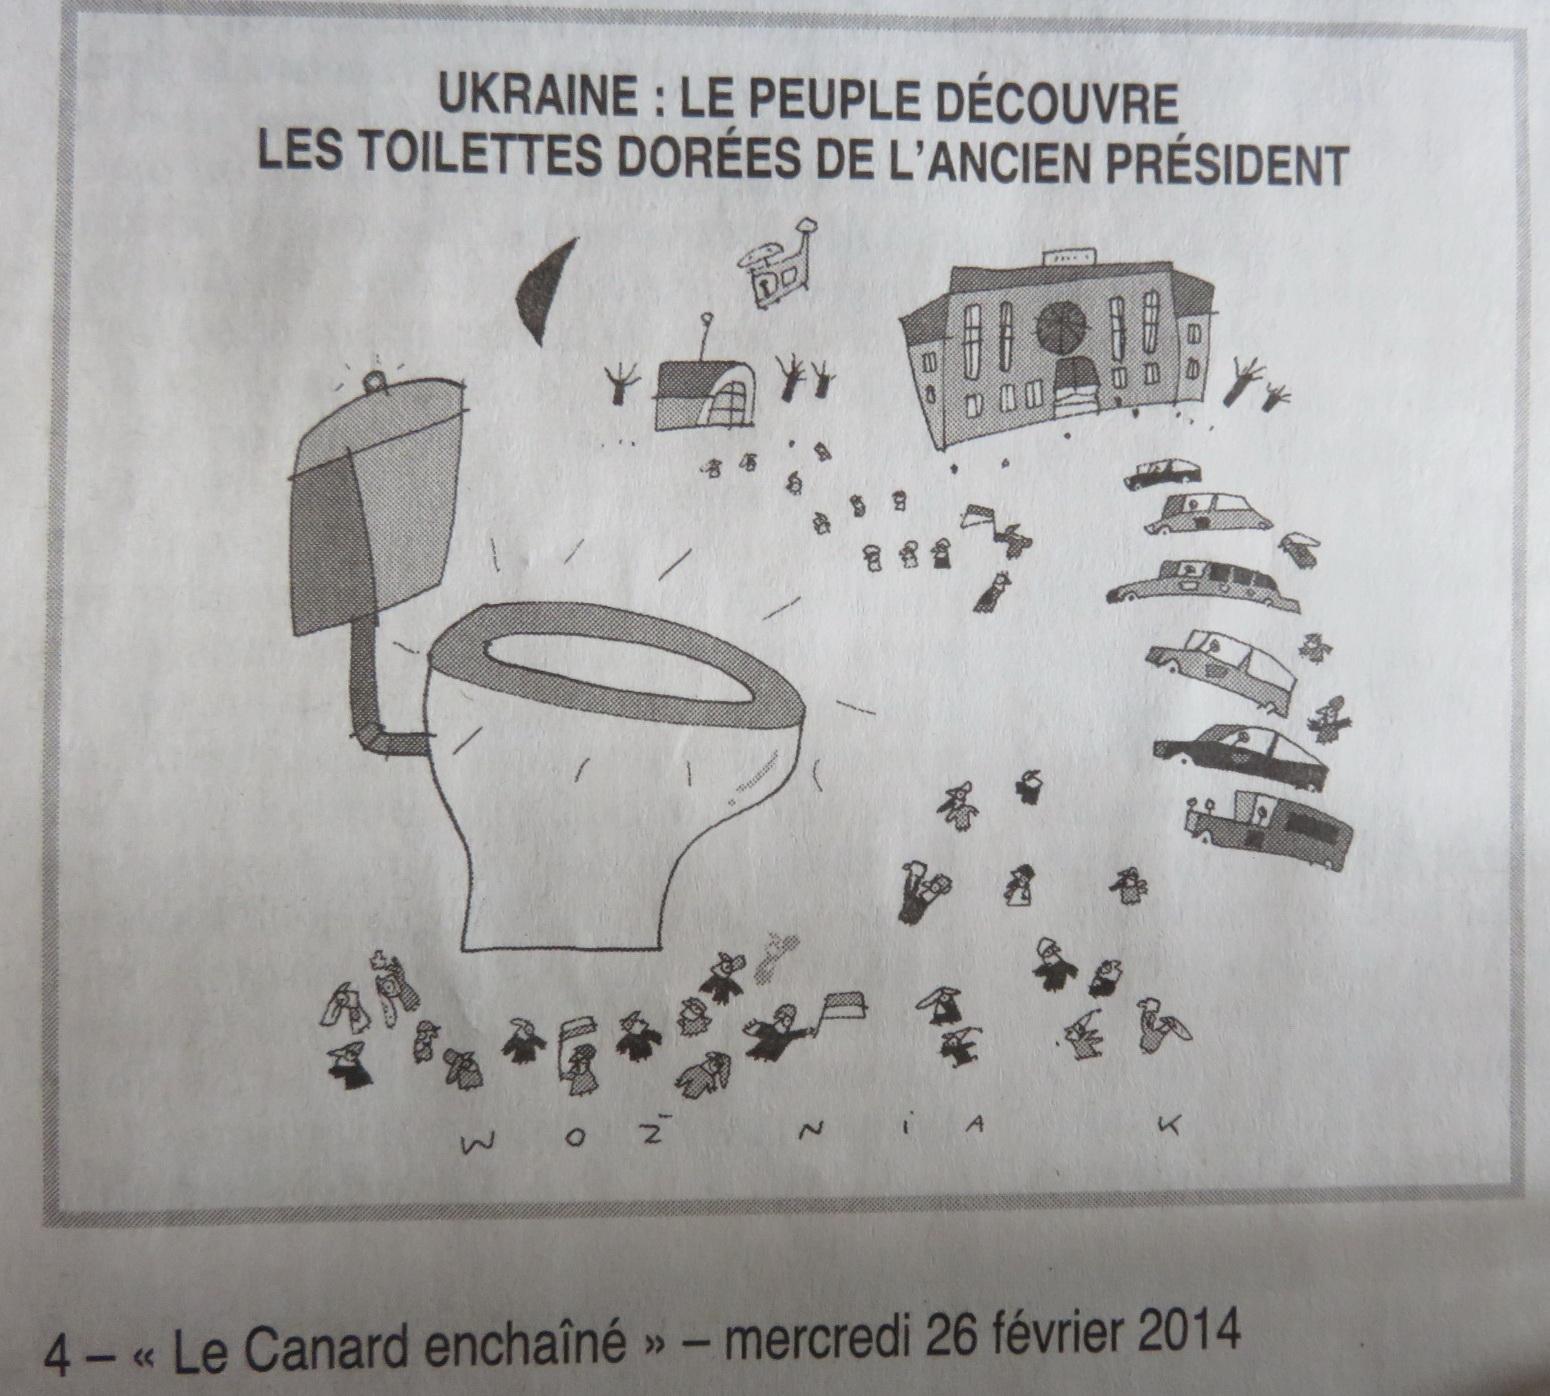 canard enchaine ukraine 2014